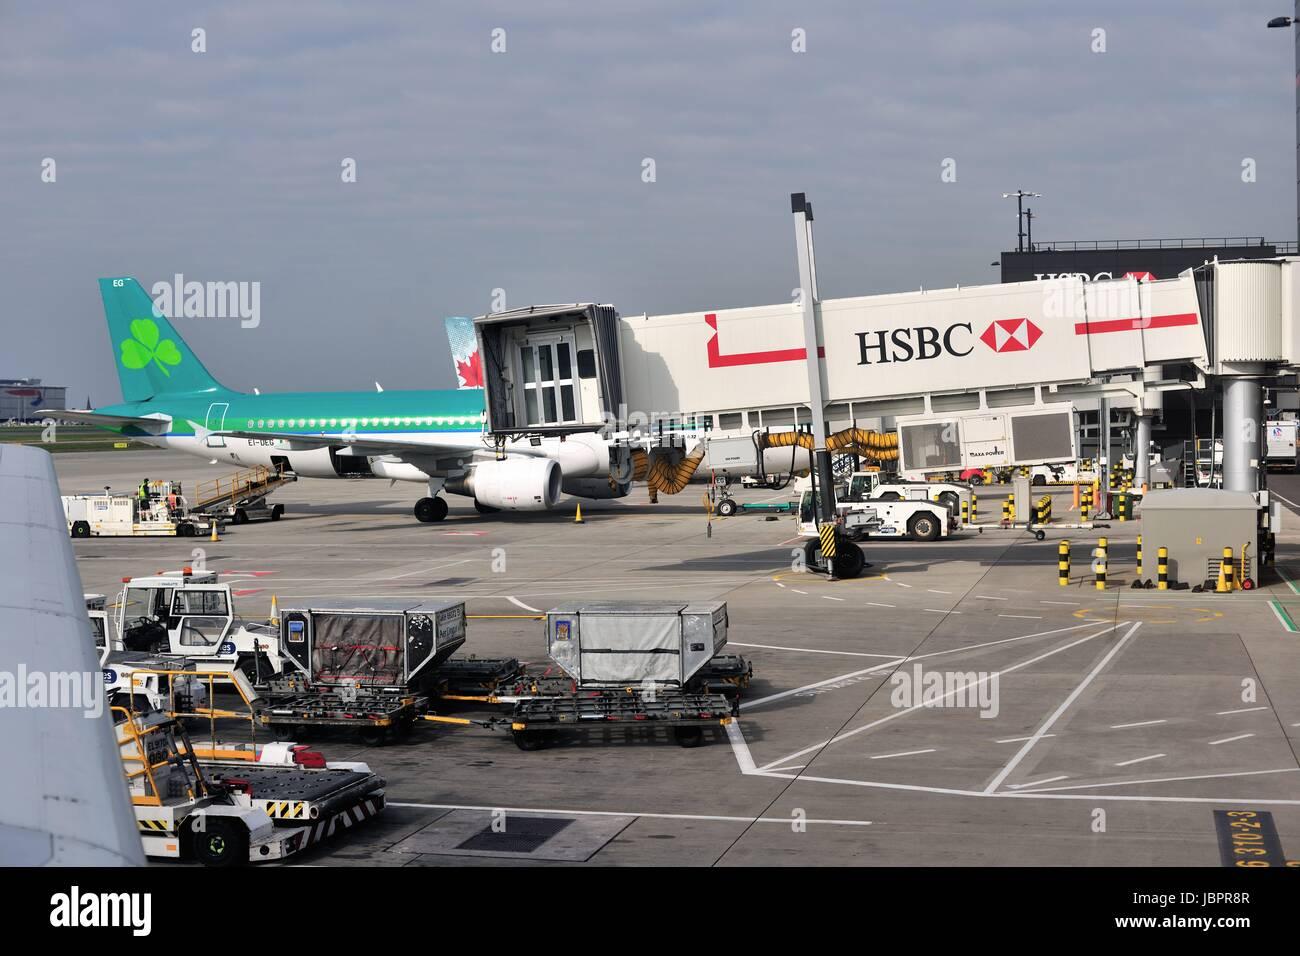 Aer Lingus aircraft at terminal building amidst activity at London's Heathrow International Airport. London, - Stock Image